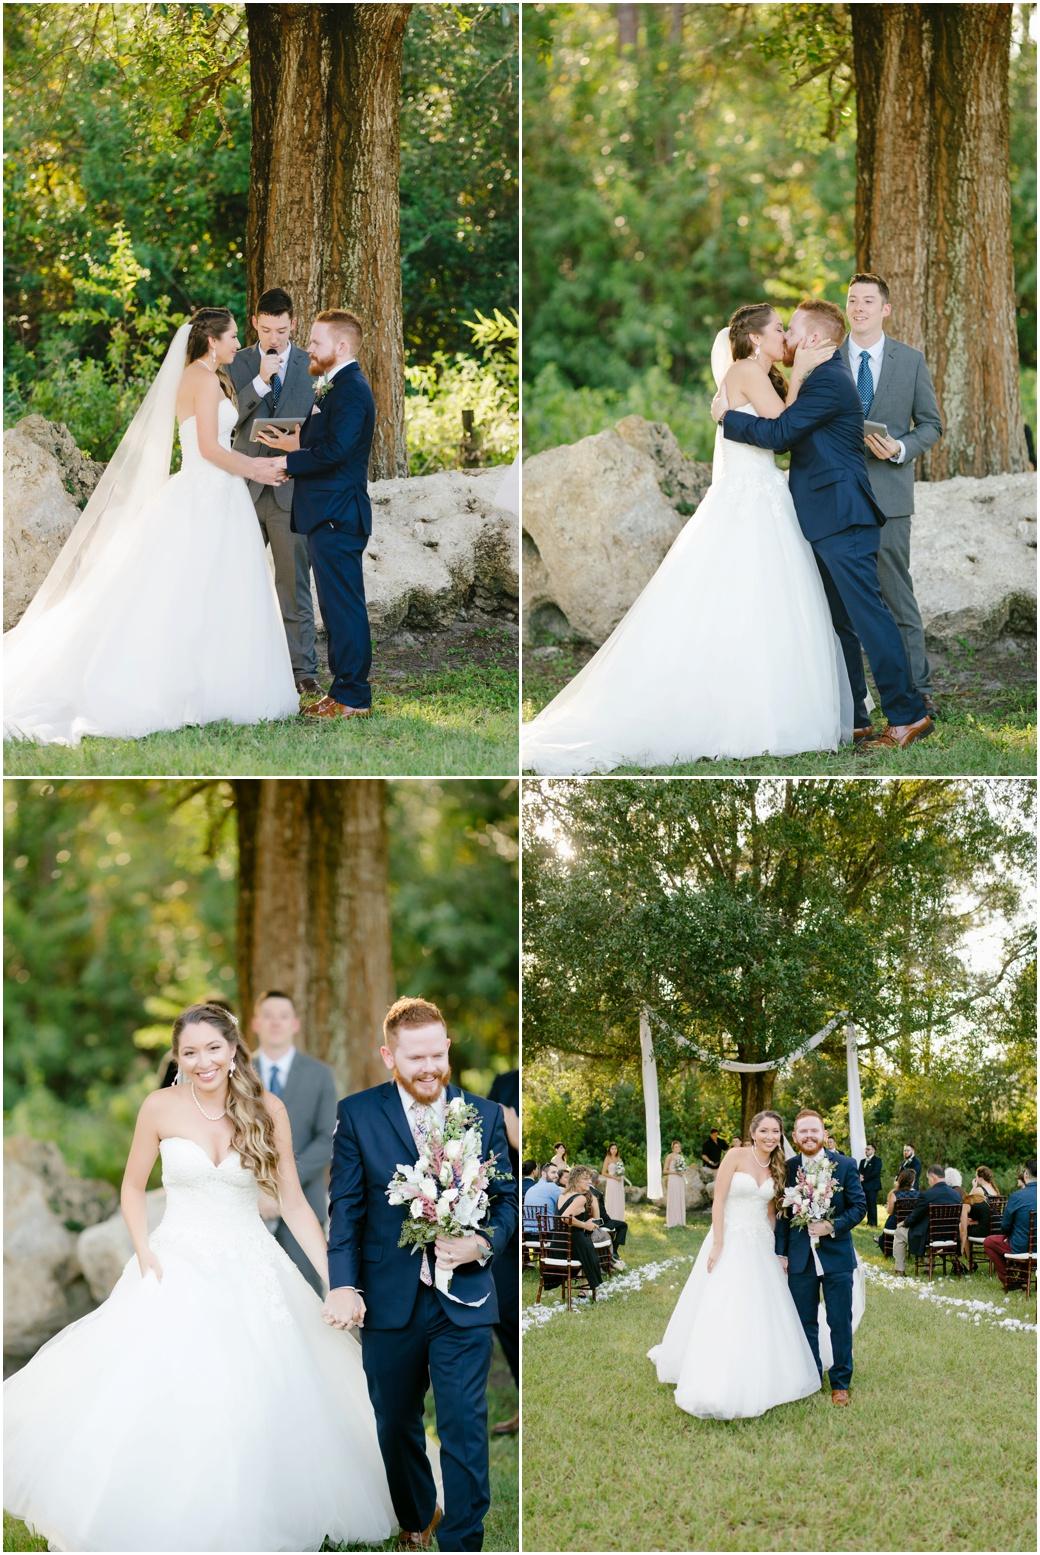 Dalziel-ft-myers-wedding-00012